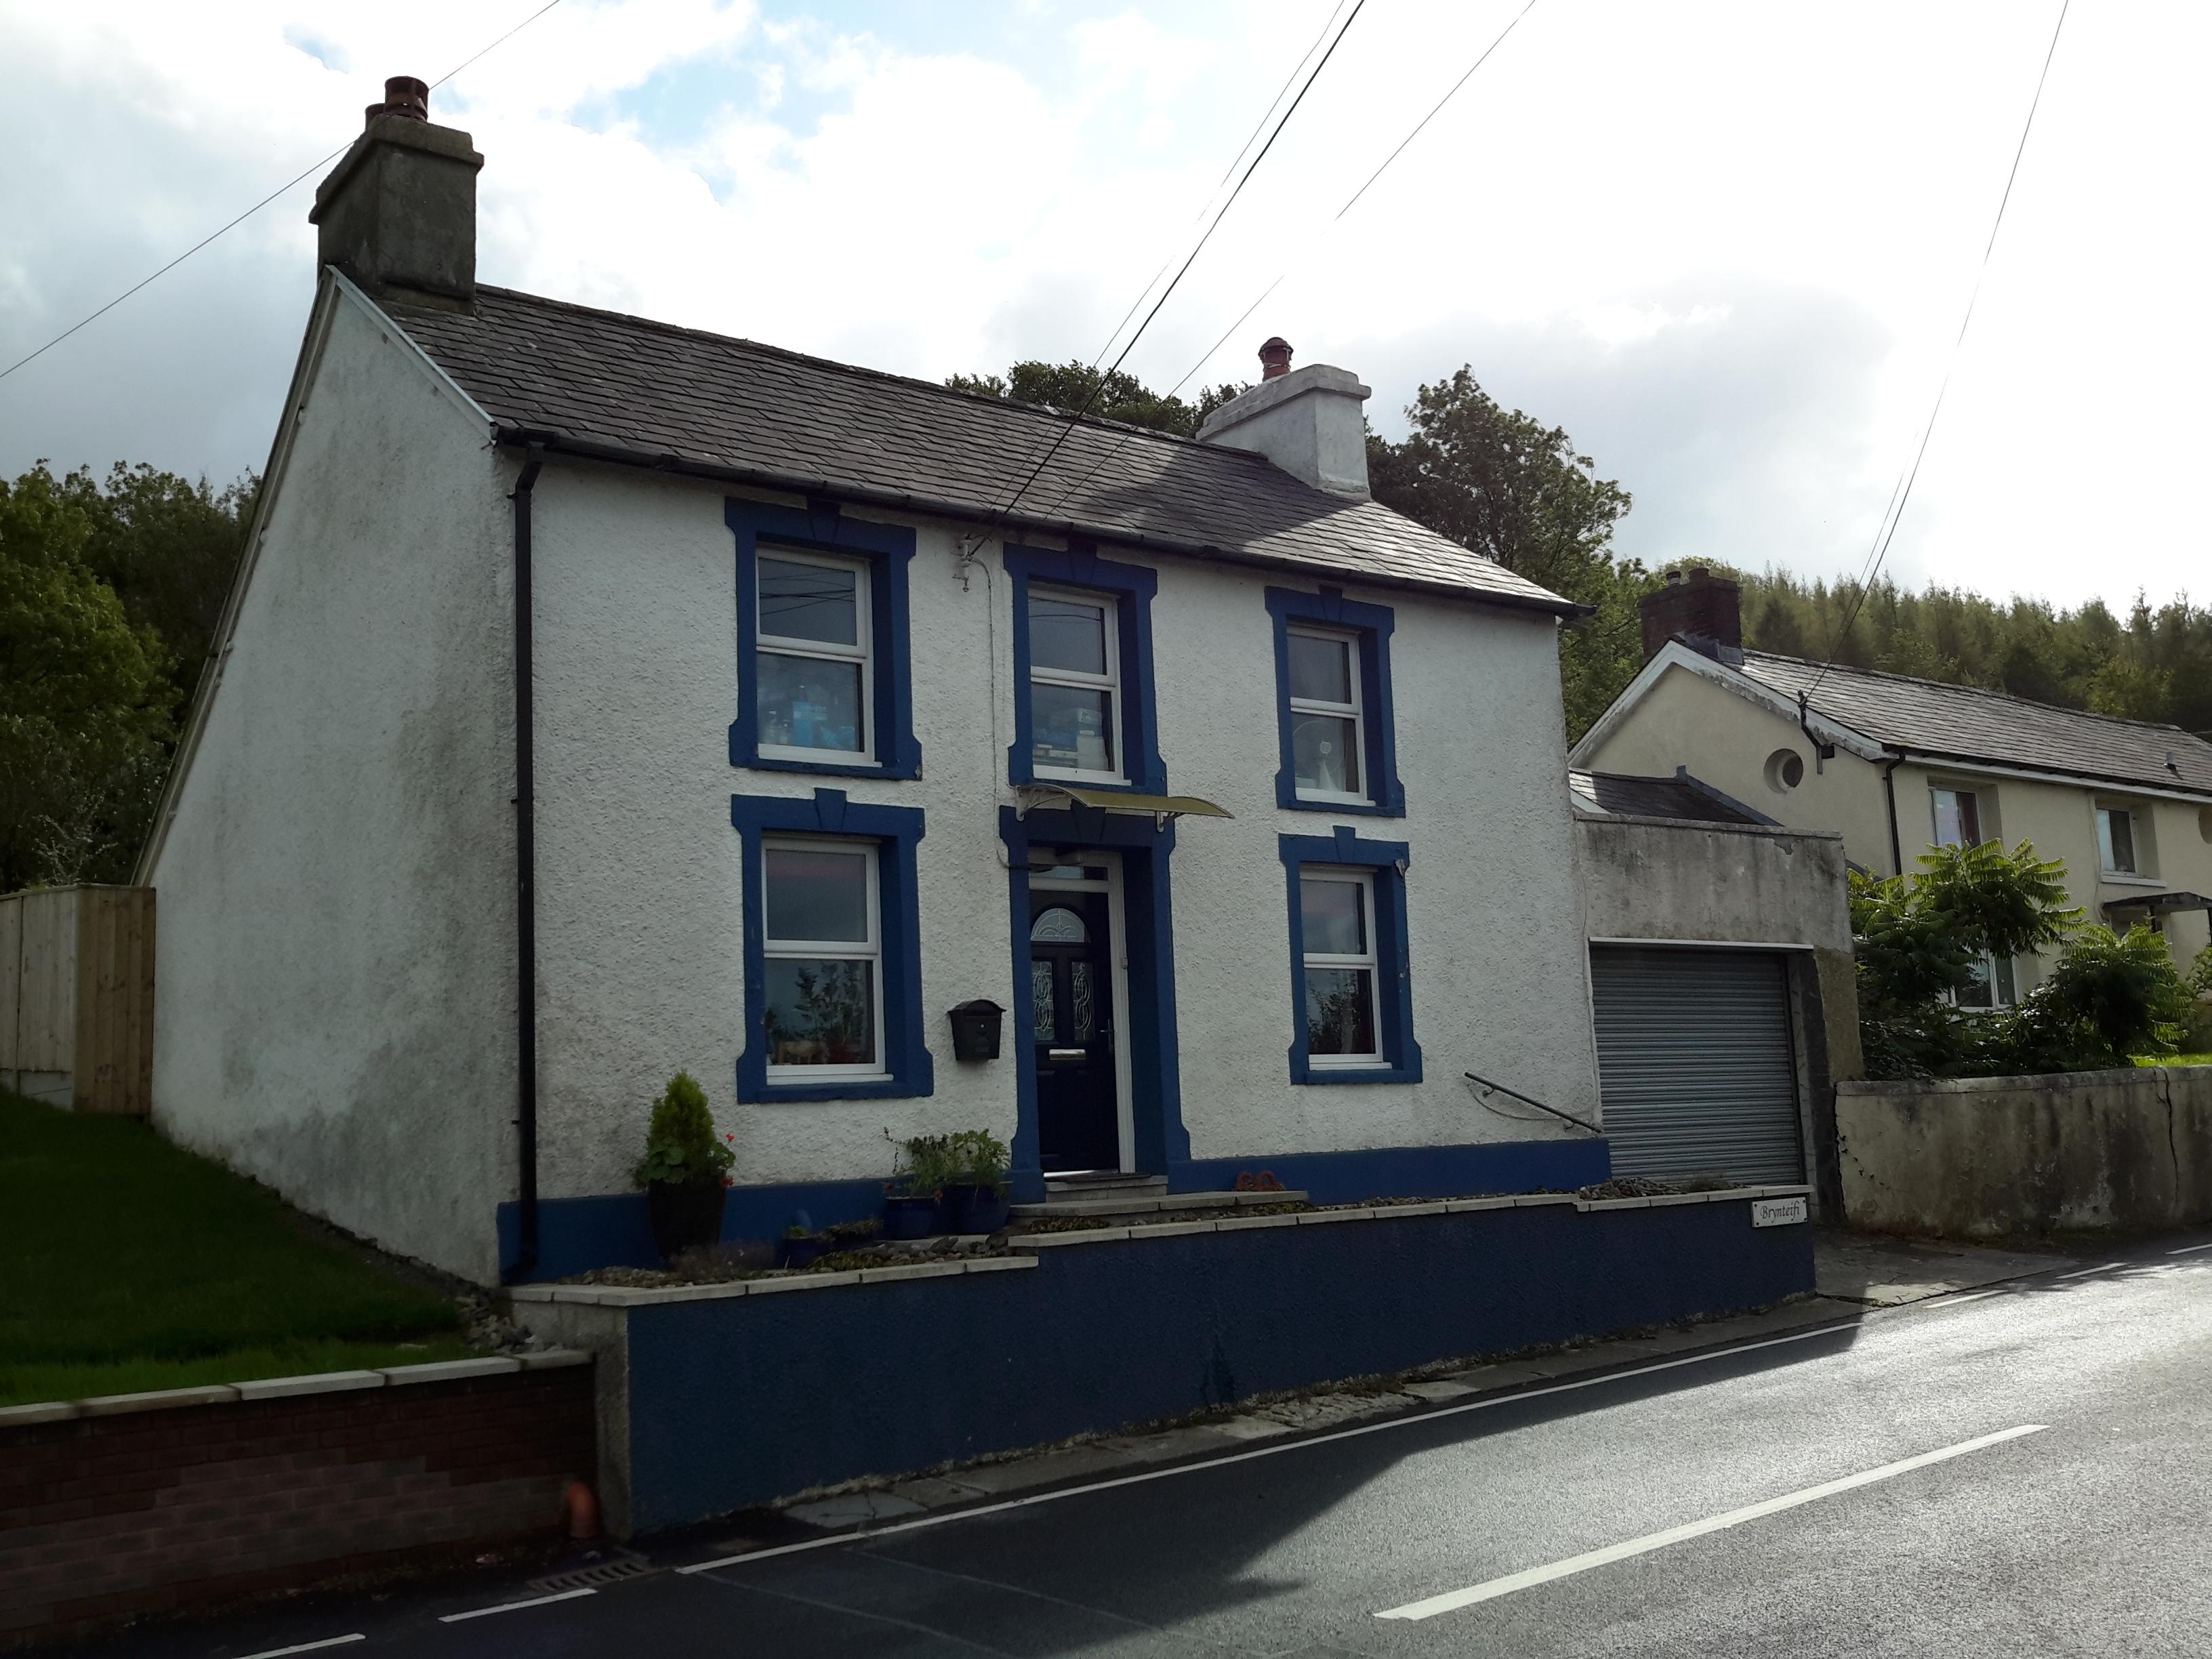 Brynteifi, Llanybydder, Carmarthenshire, SA40 9SD image